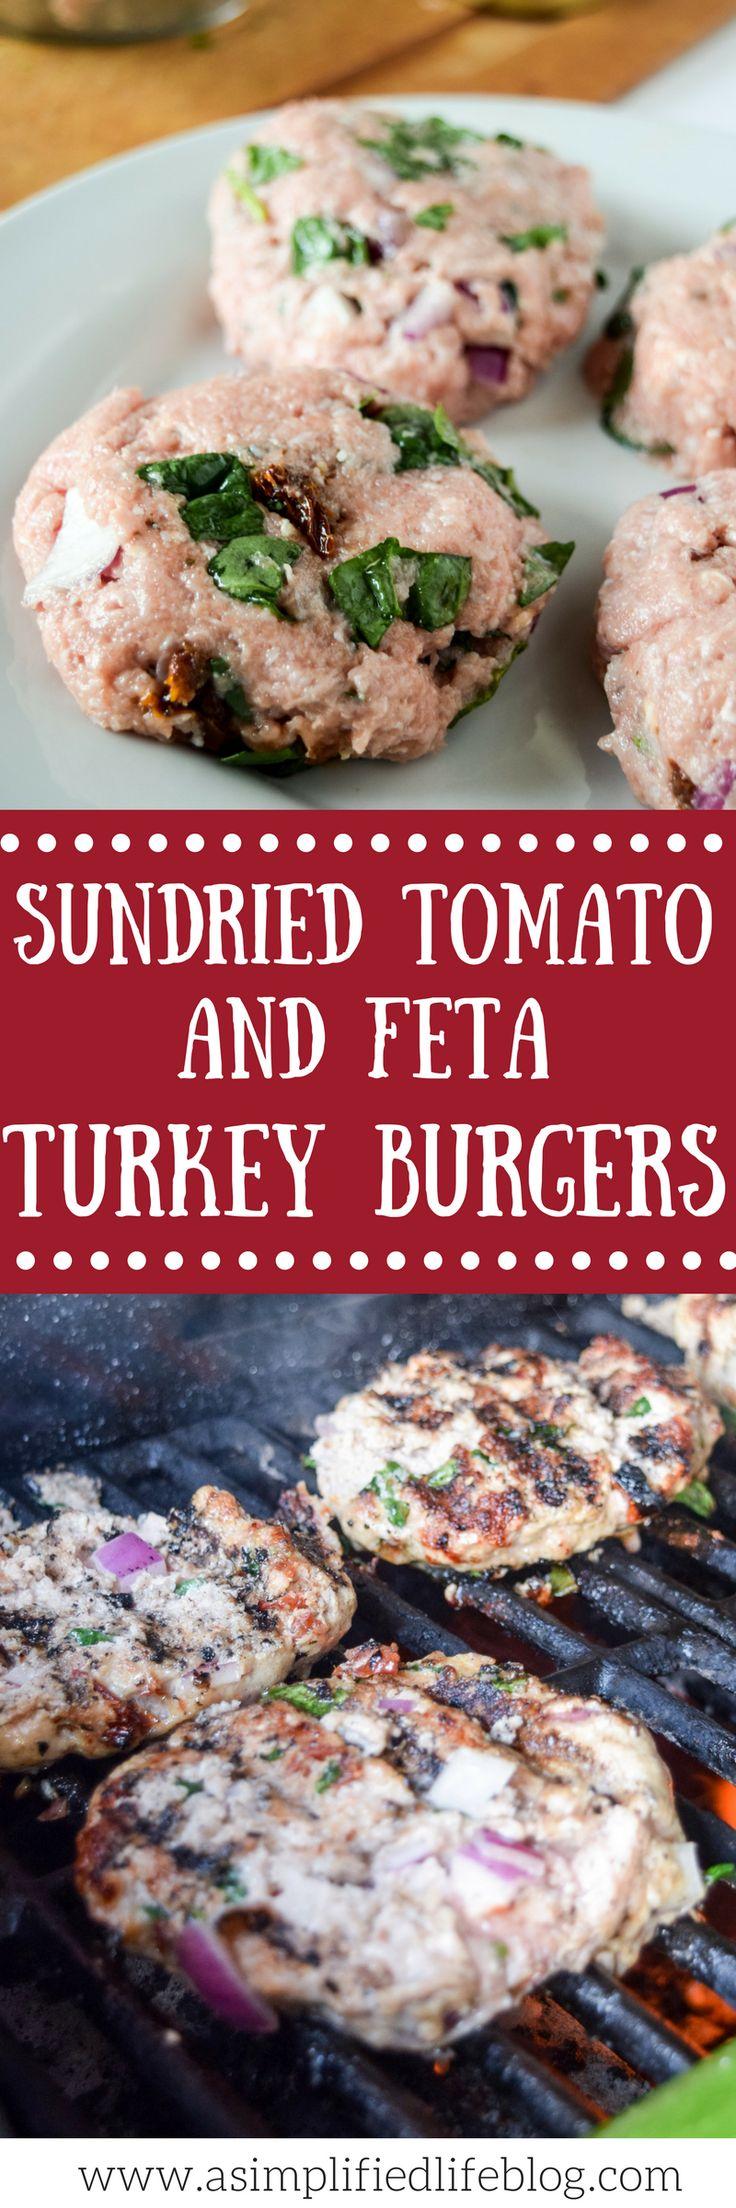 turkey burger recipe   turkey burgers   how to make turkey burgers   healthy bbq ideas   sundried tomato and feta turkey burgers   summer grilling ideas  